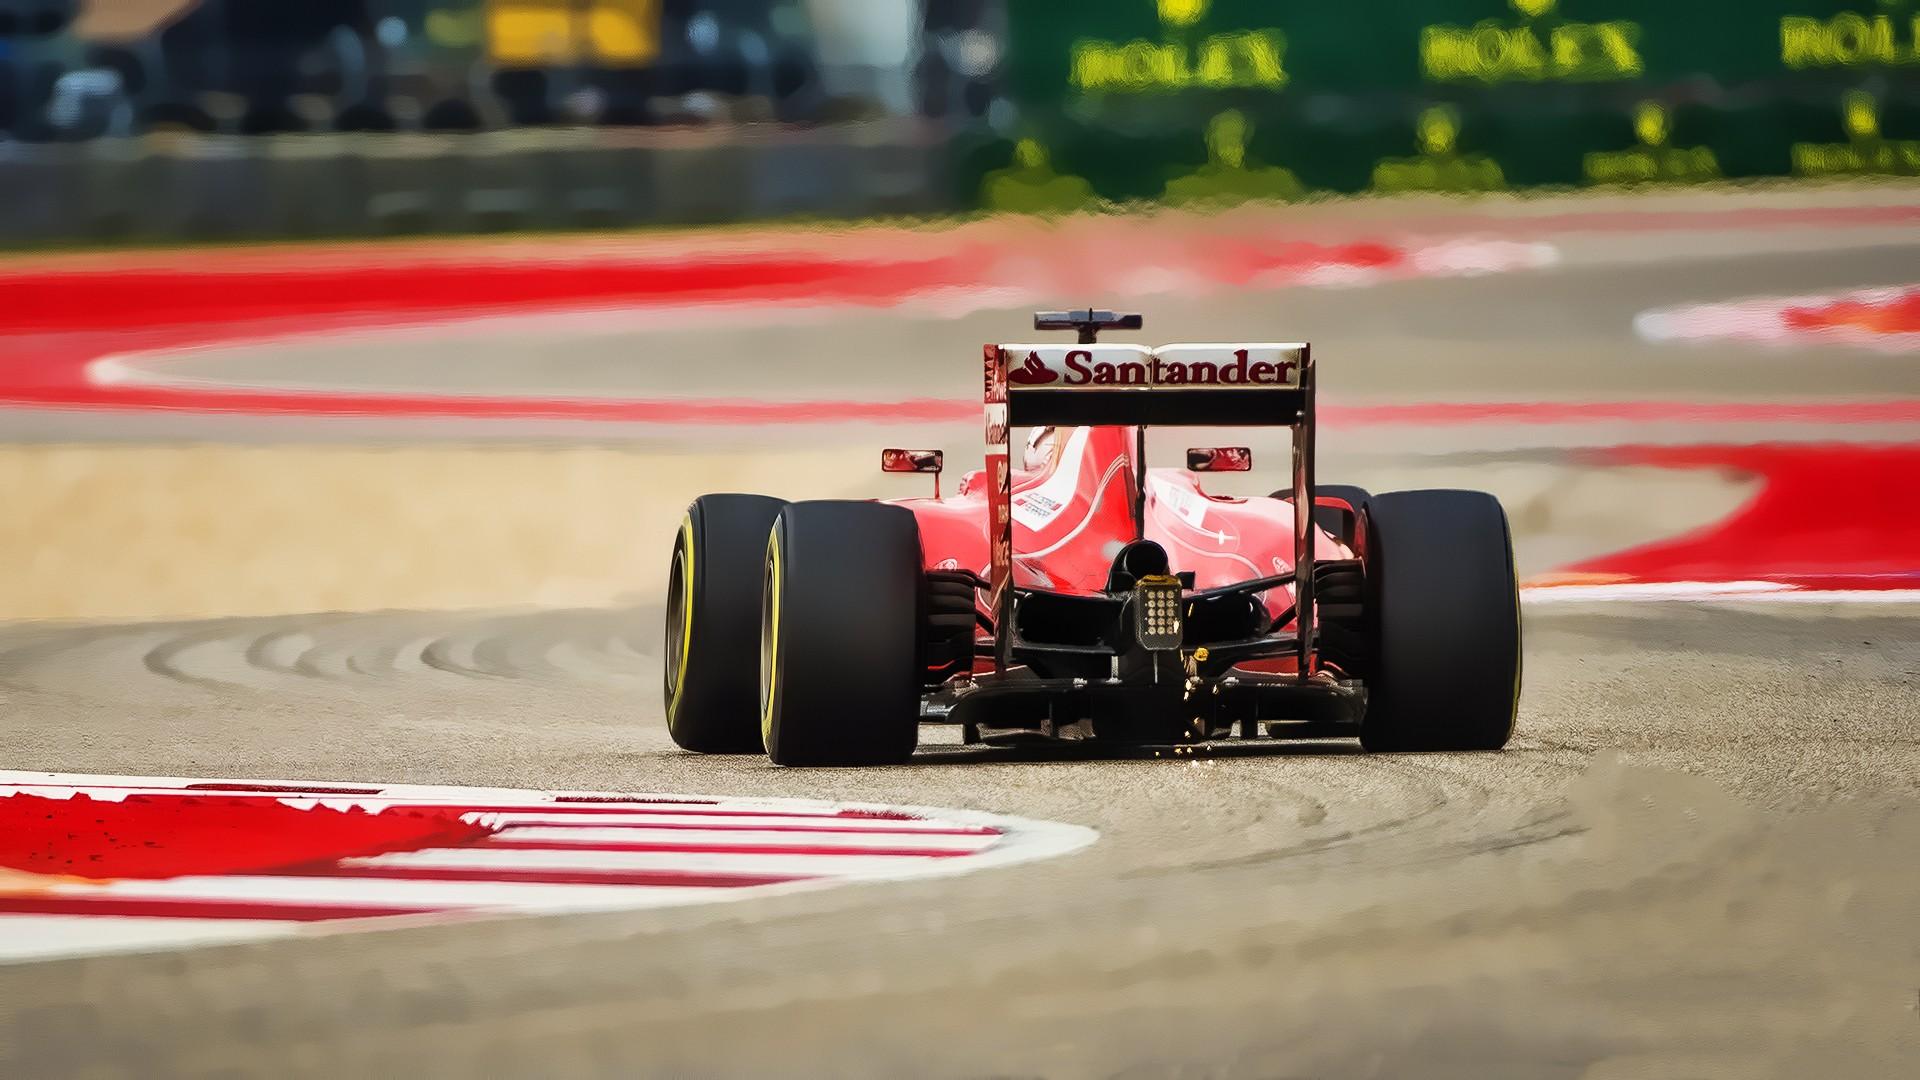 Wallpaper Sports Vehicle Formula 1 Ferrari Structure Supercar